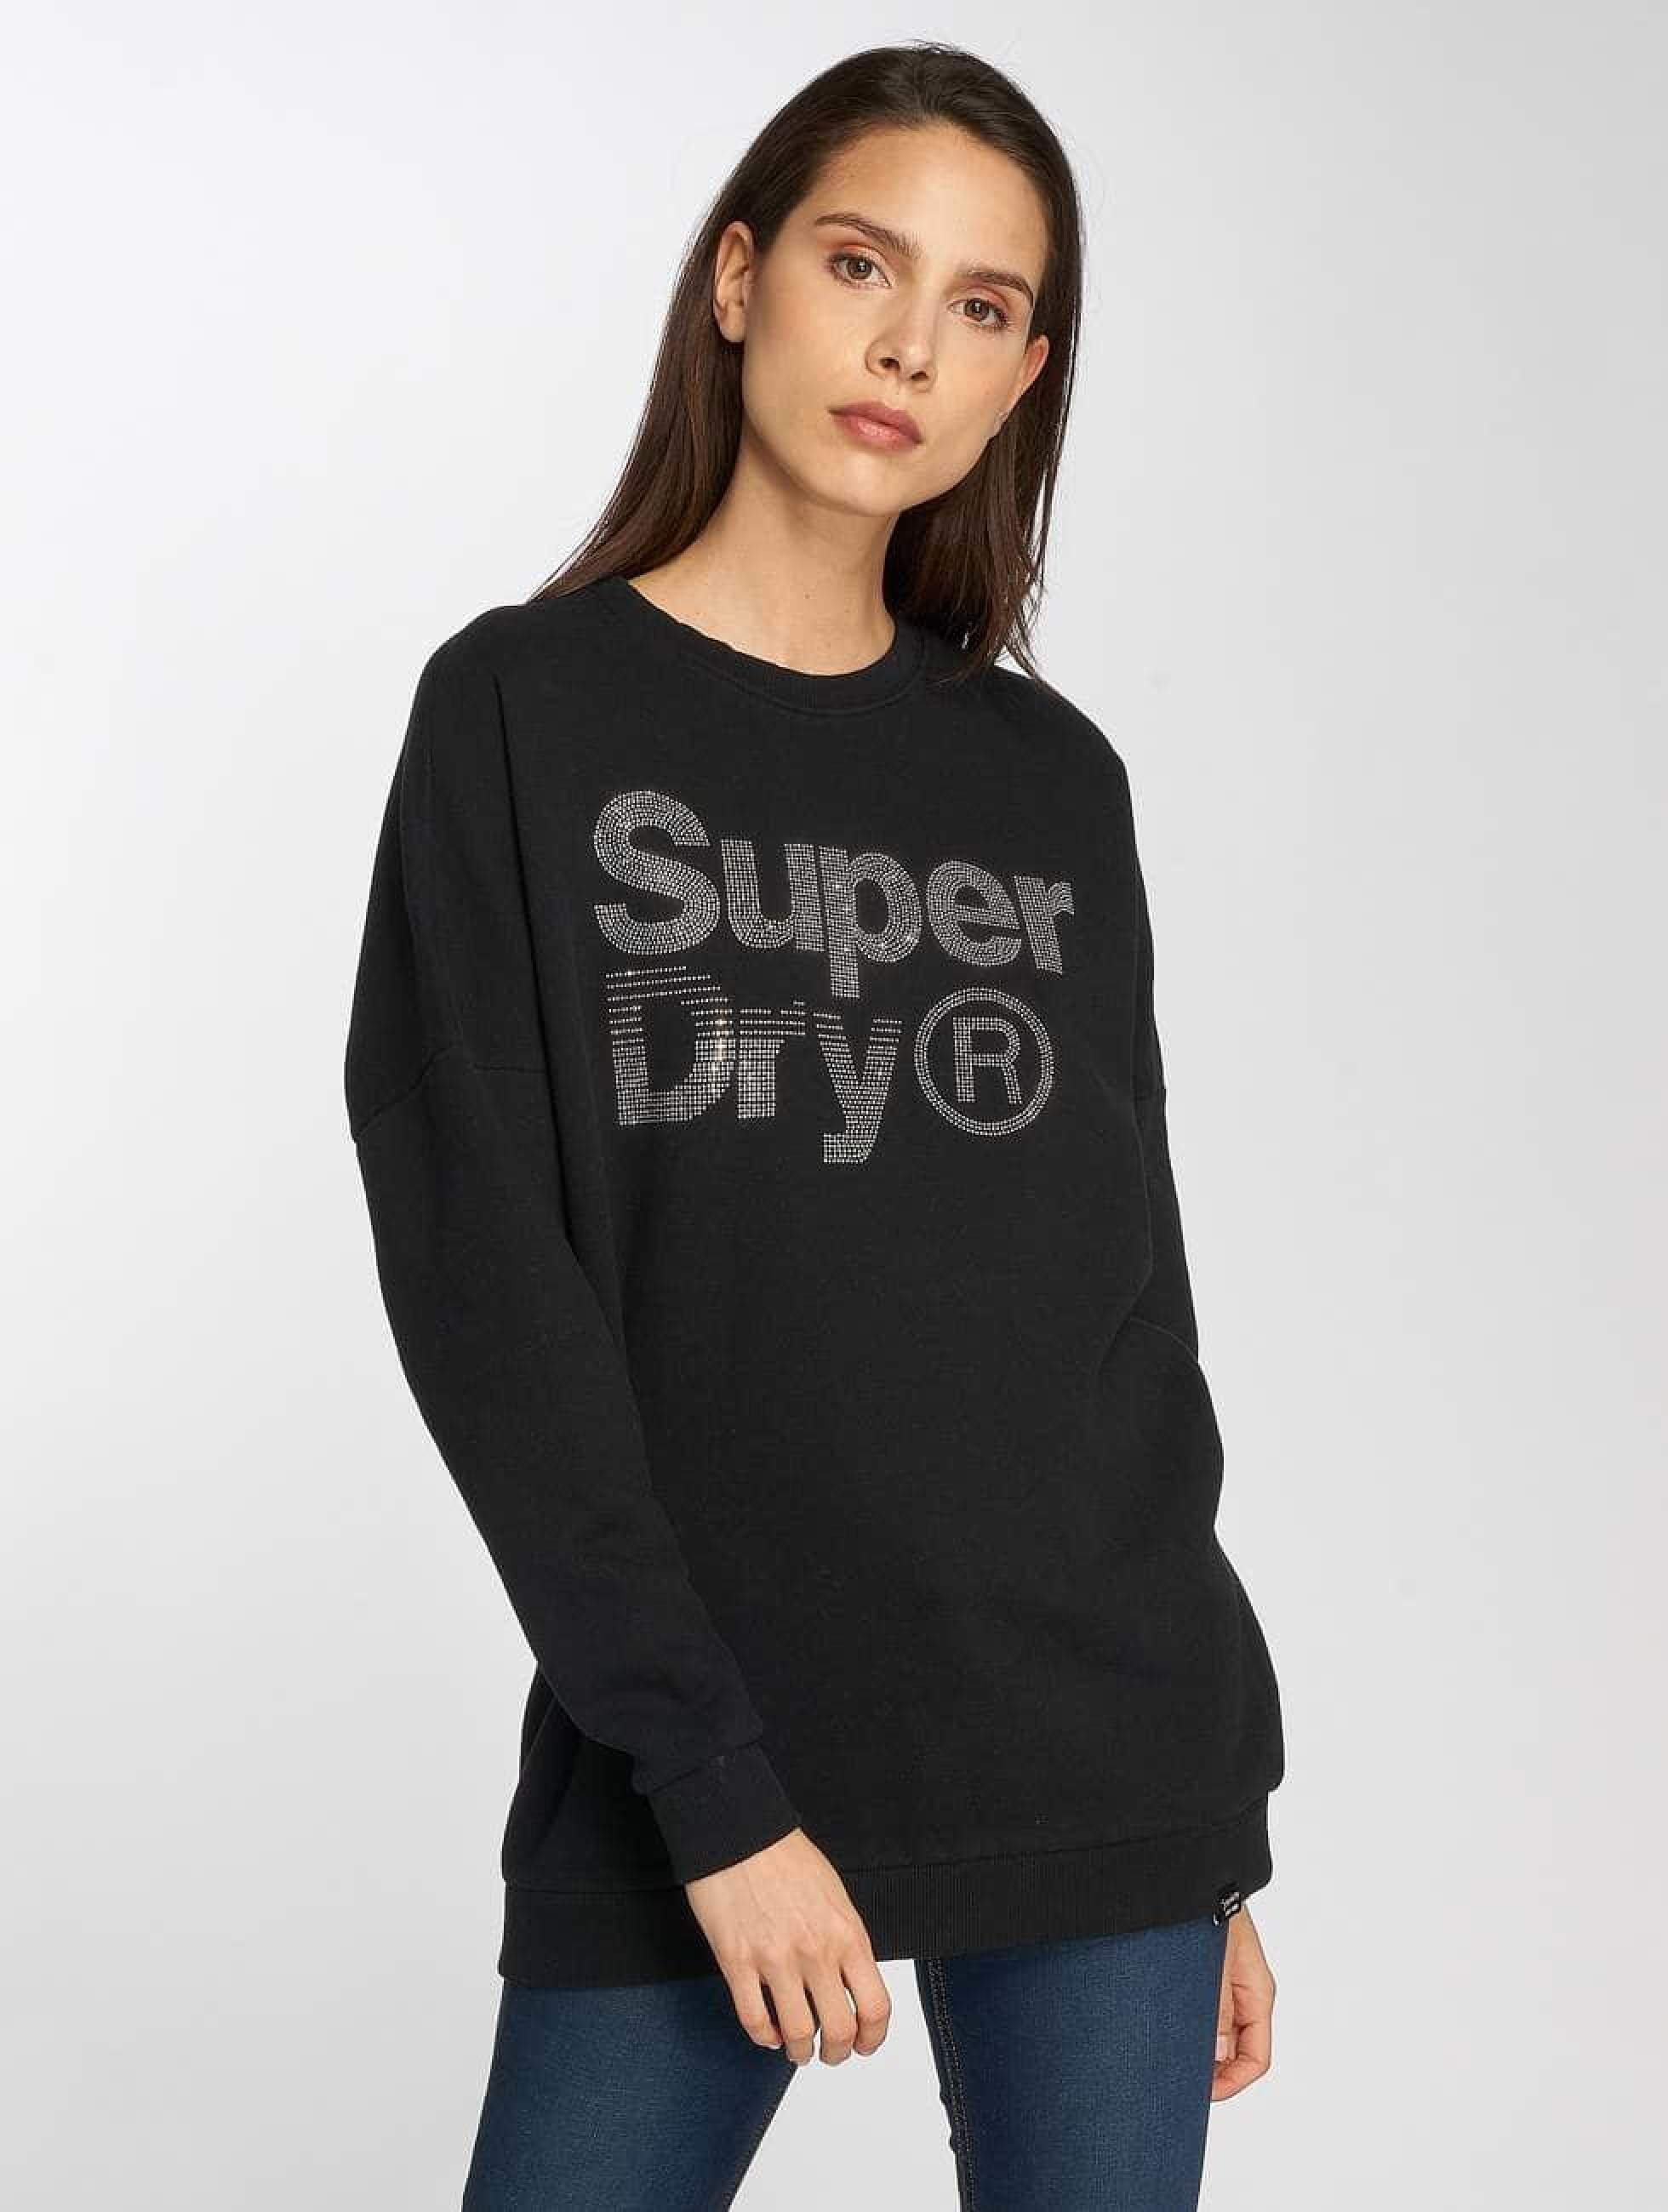 Noir Sparkle Superdry Amp; Sweat 449642 Skater Femme Pull Zzwr5 x54OwXCIq